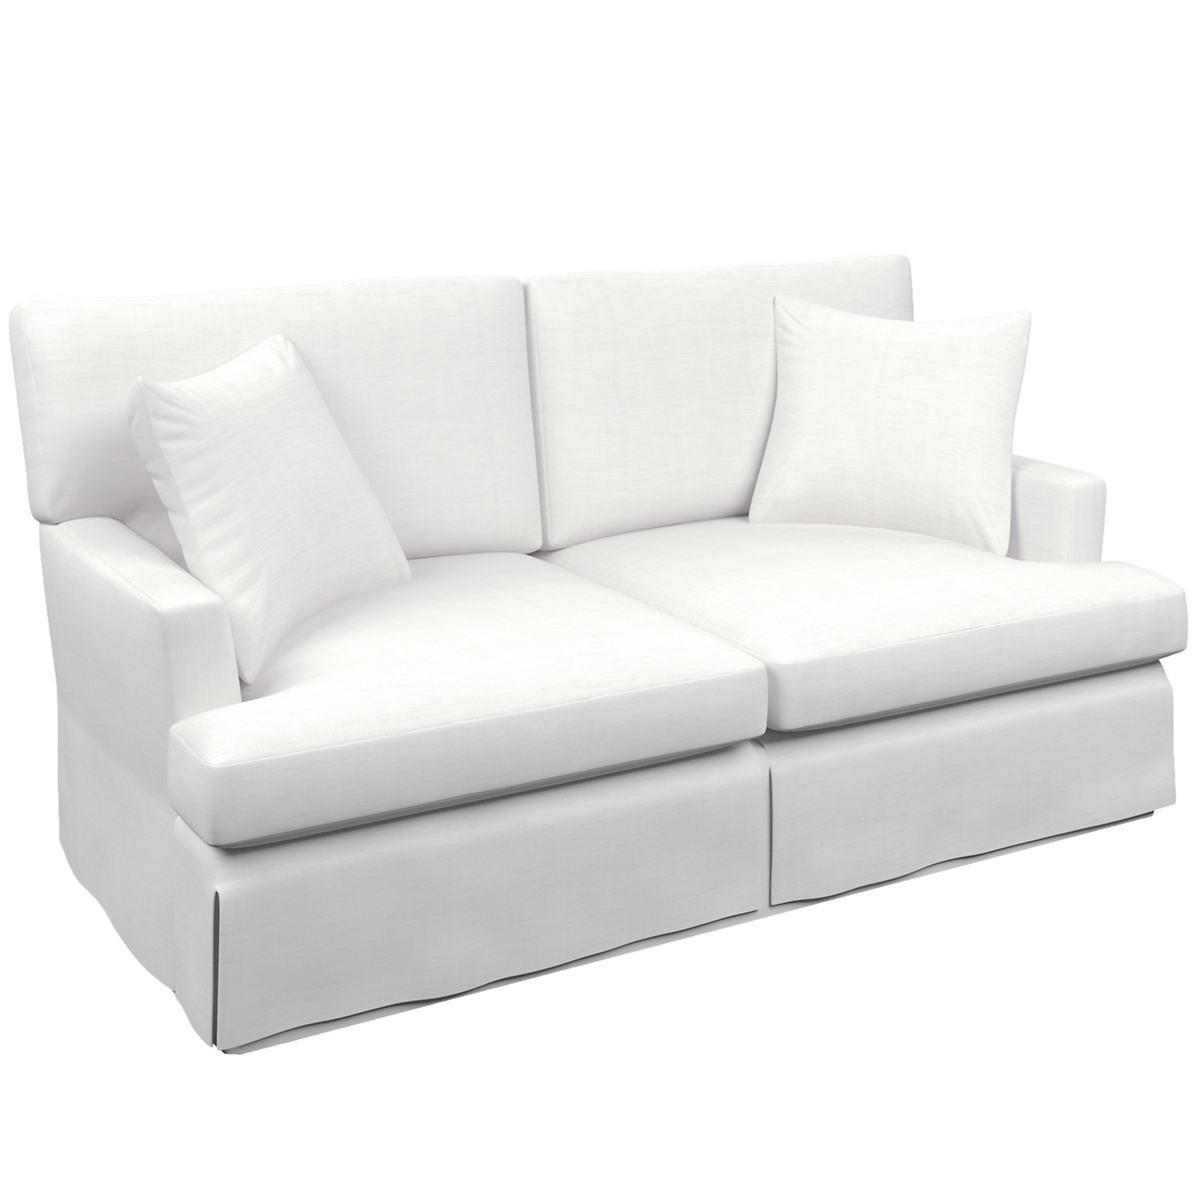 White Saybrook 2 Seater Sofa